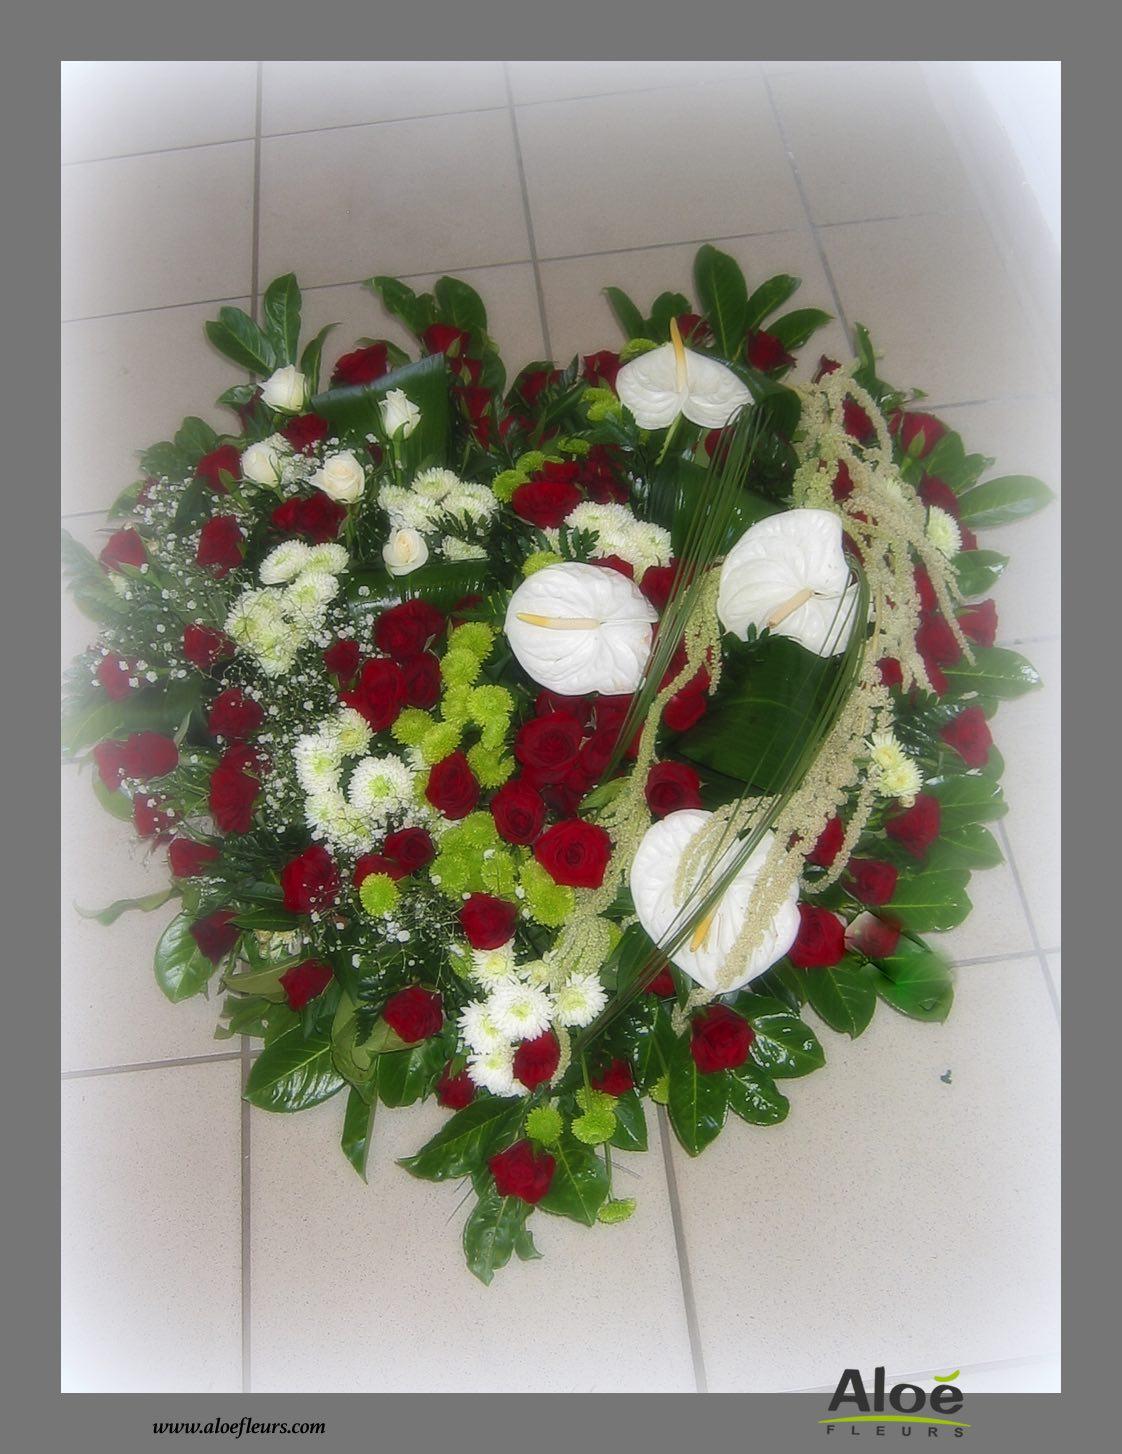 composition florale deuil coeur 5 aloe fleurs. Black Bedroom Furniture Sets. Home Design Ideas